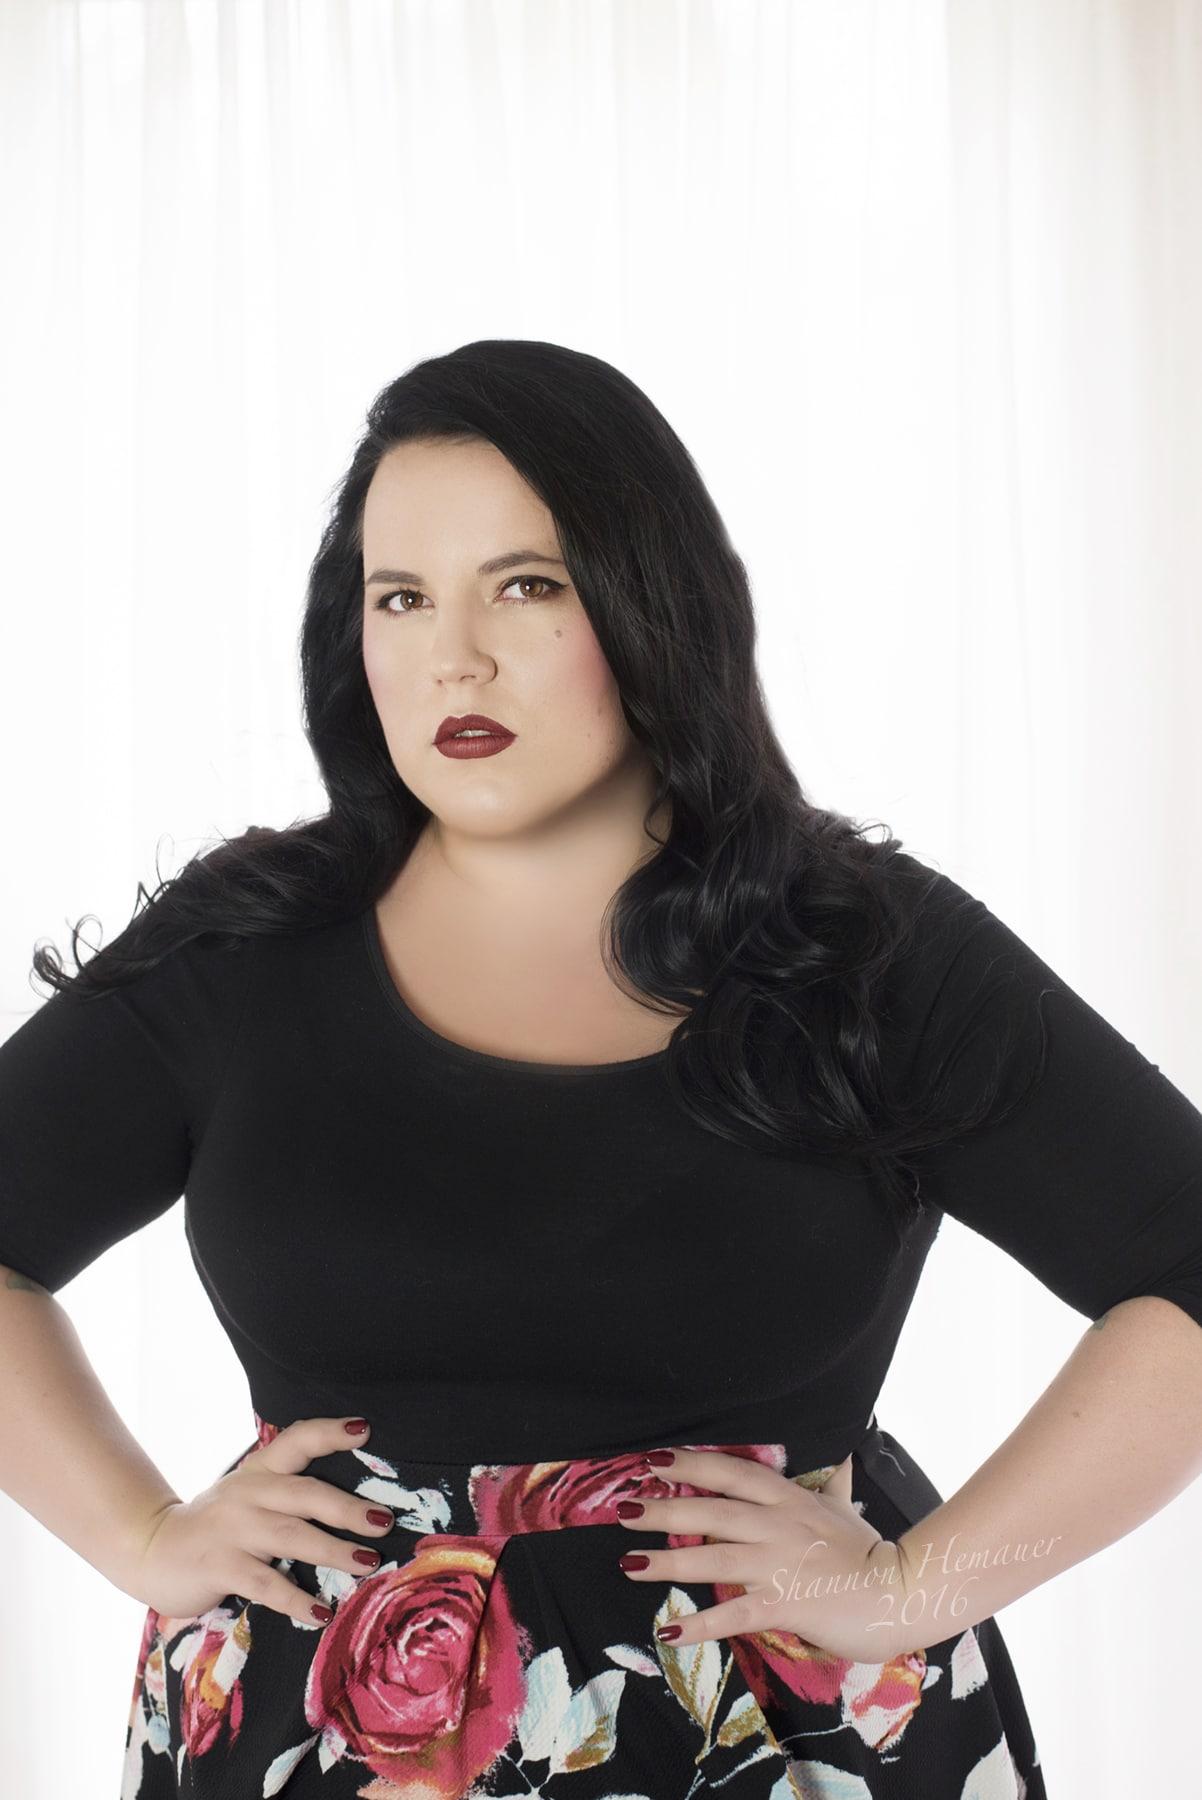 Professional hair and makeup artist Caitlin Harlin Carlisle PA Shannon Hemauer Photography